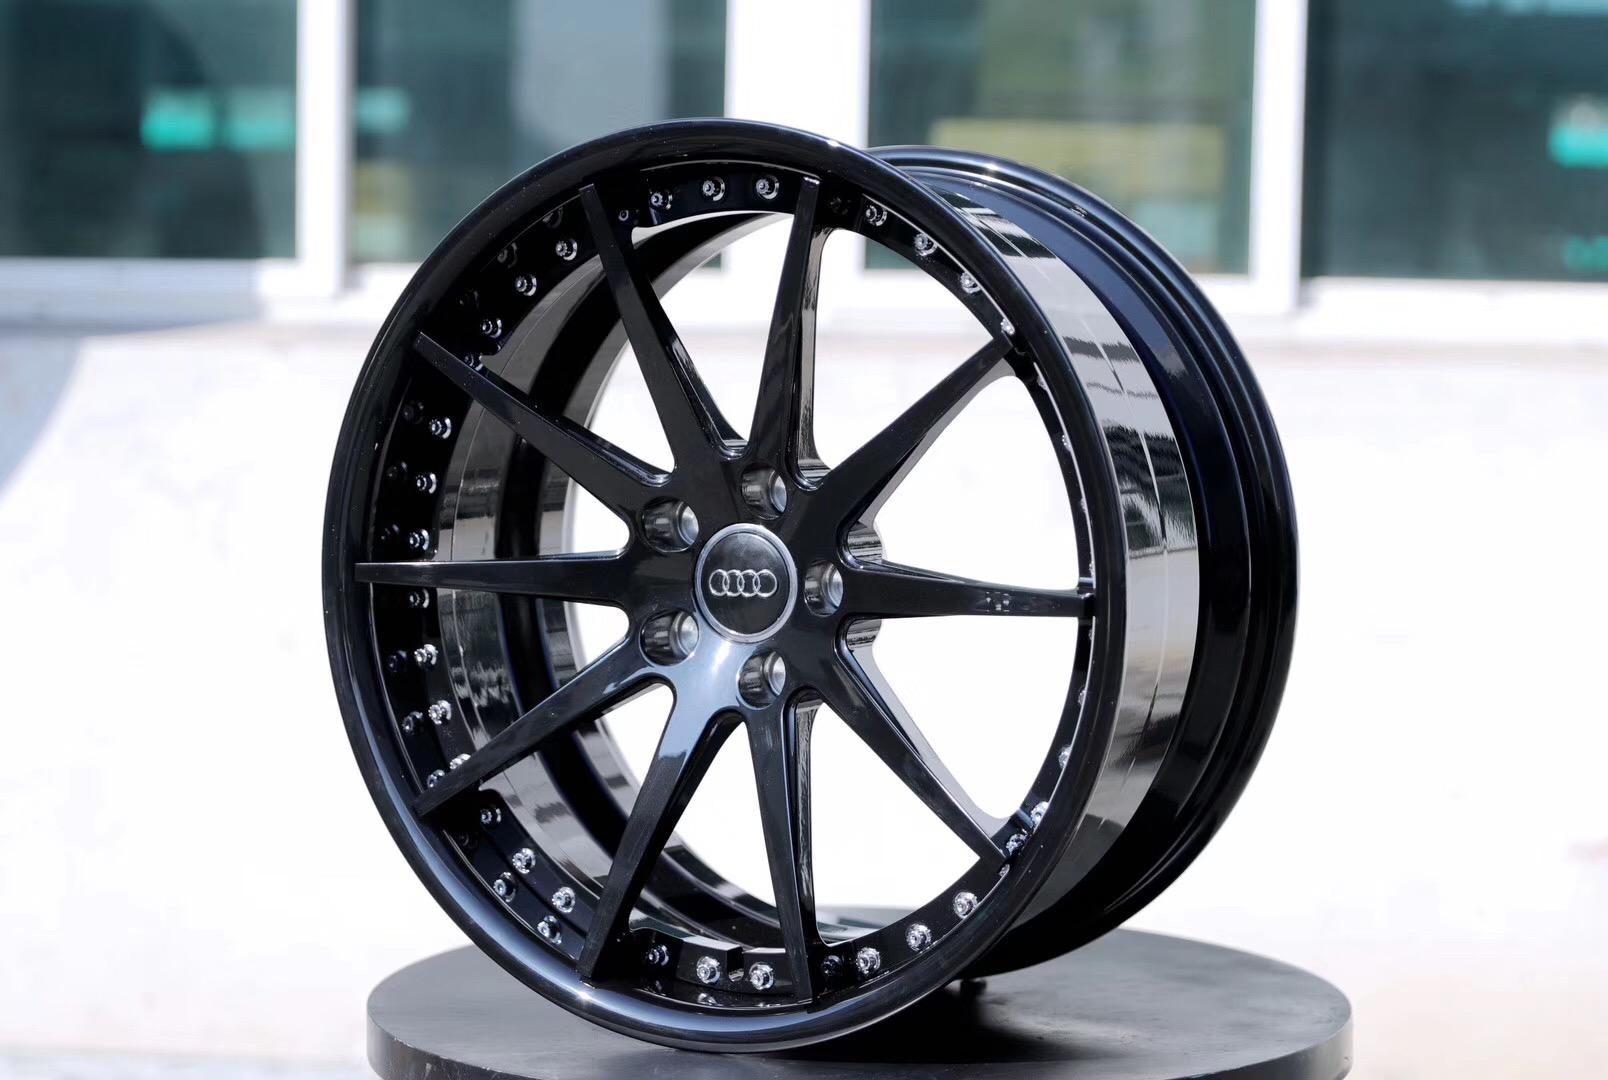 Audi forge rims A3/A4/A5/A6/A8/Q3/Q5/Q7/Q8 18-22 size provide customization